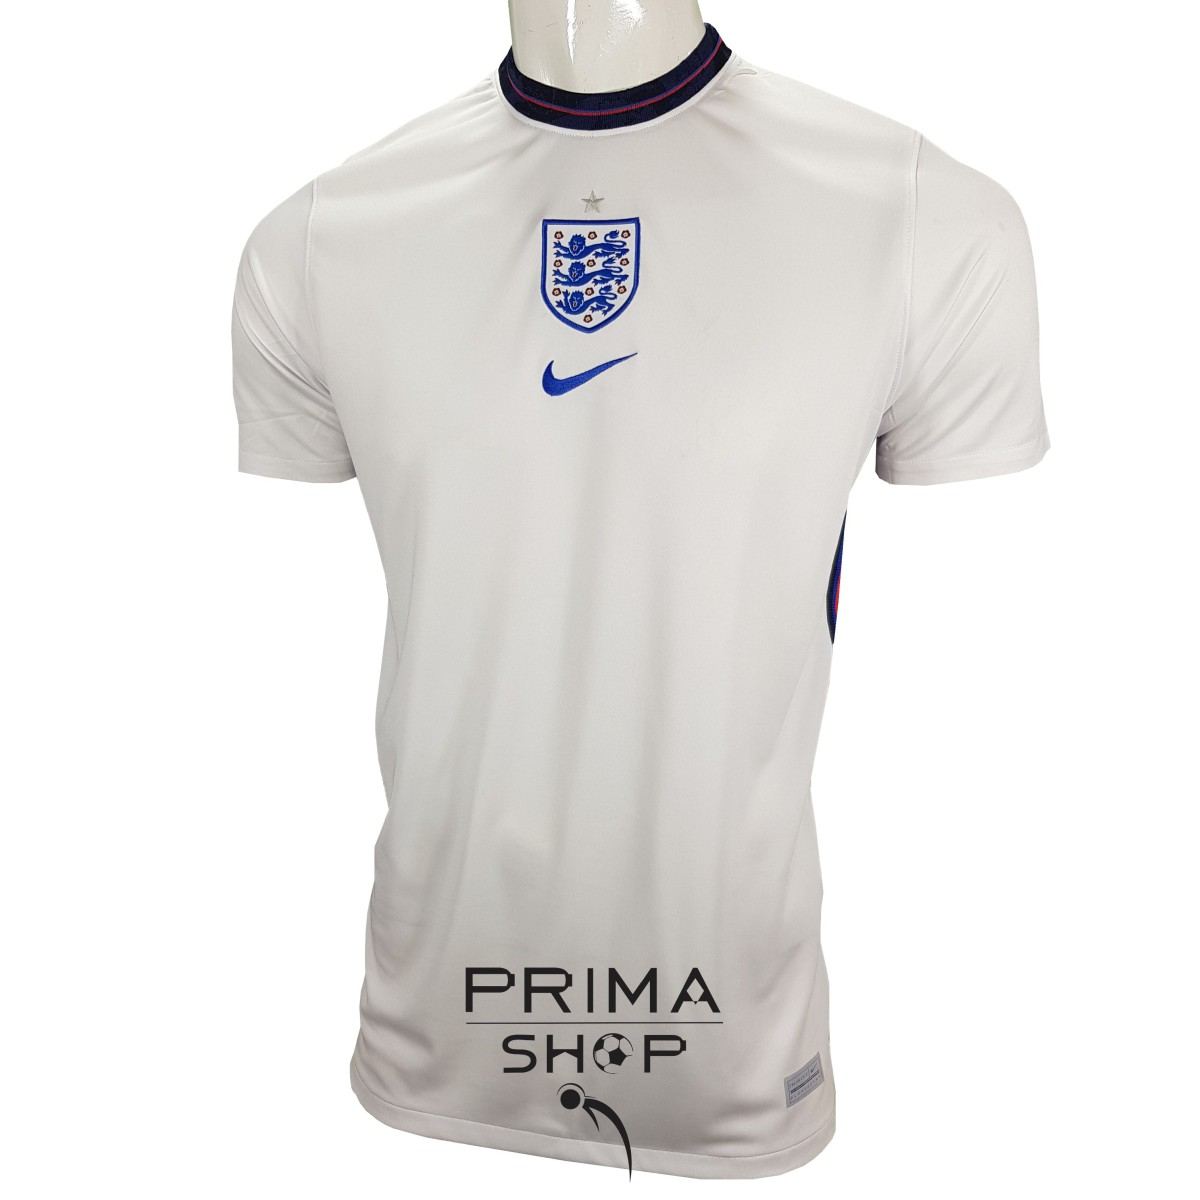 لباس انگلیس 2022